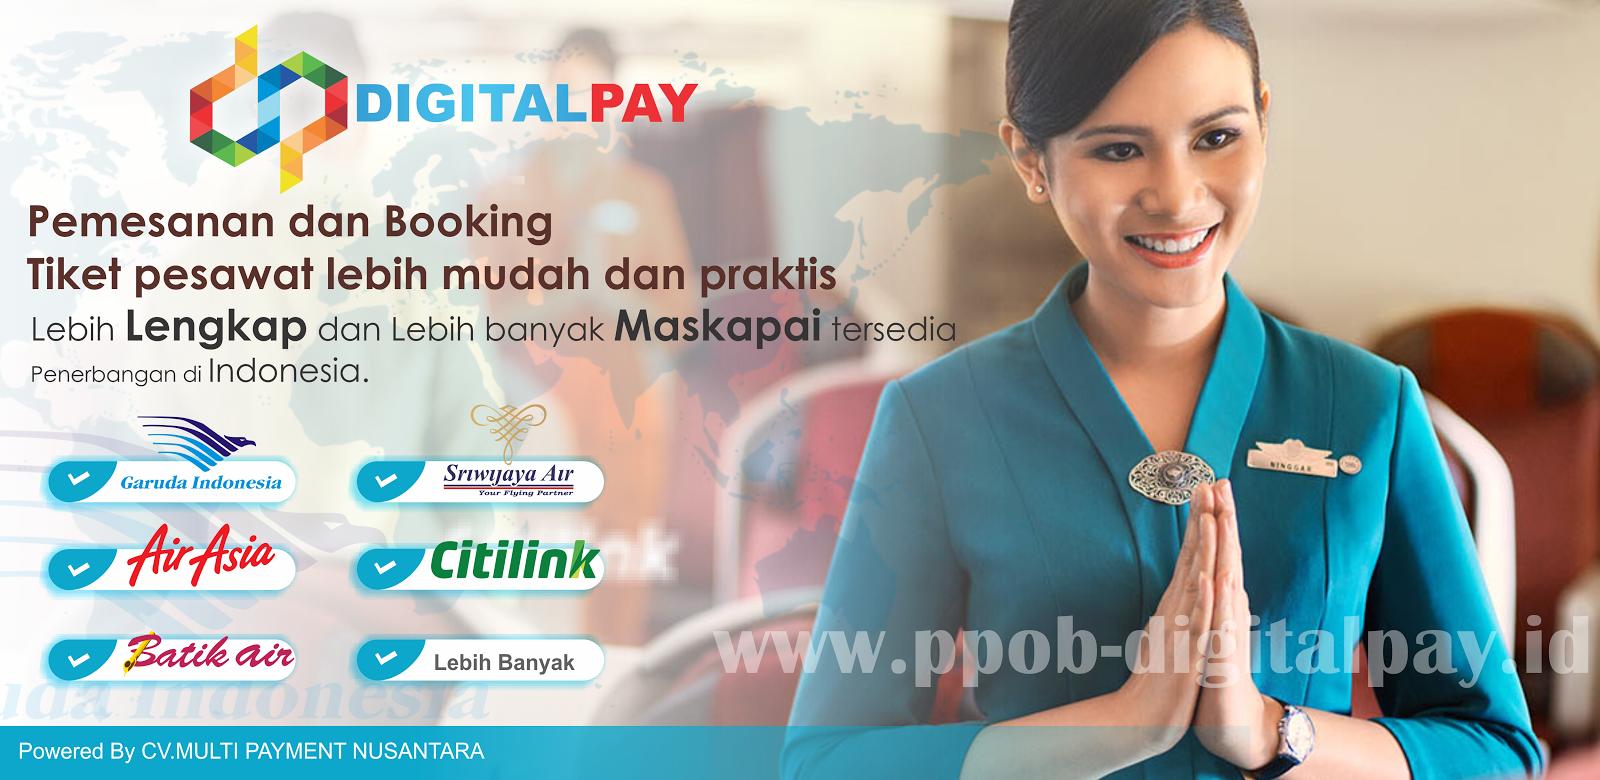 PPOB-DigitalPay